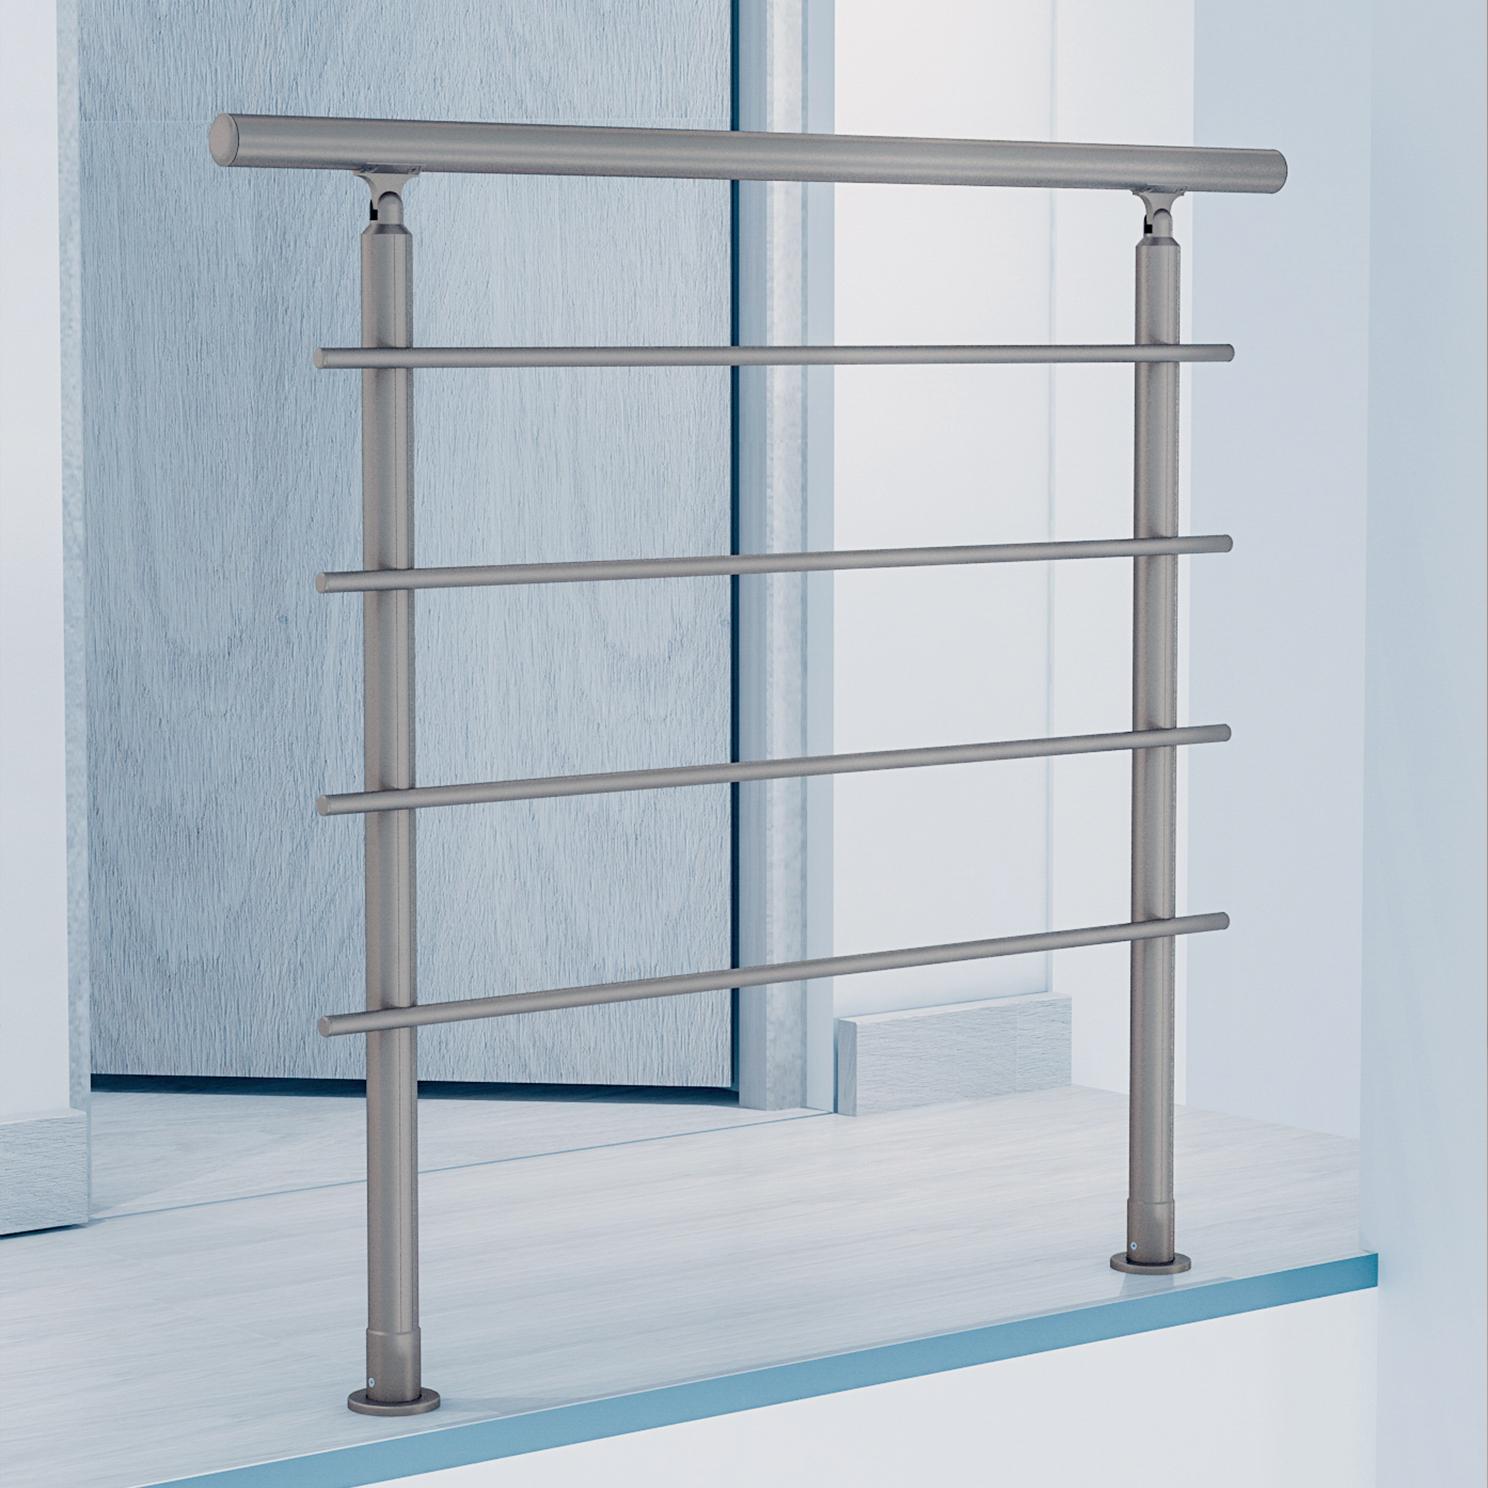 BRETAGNE - Alu anodisé inox - 120cm